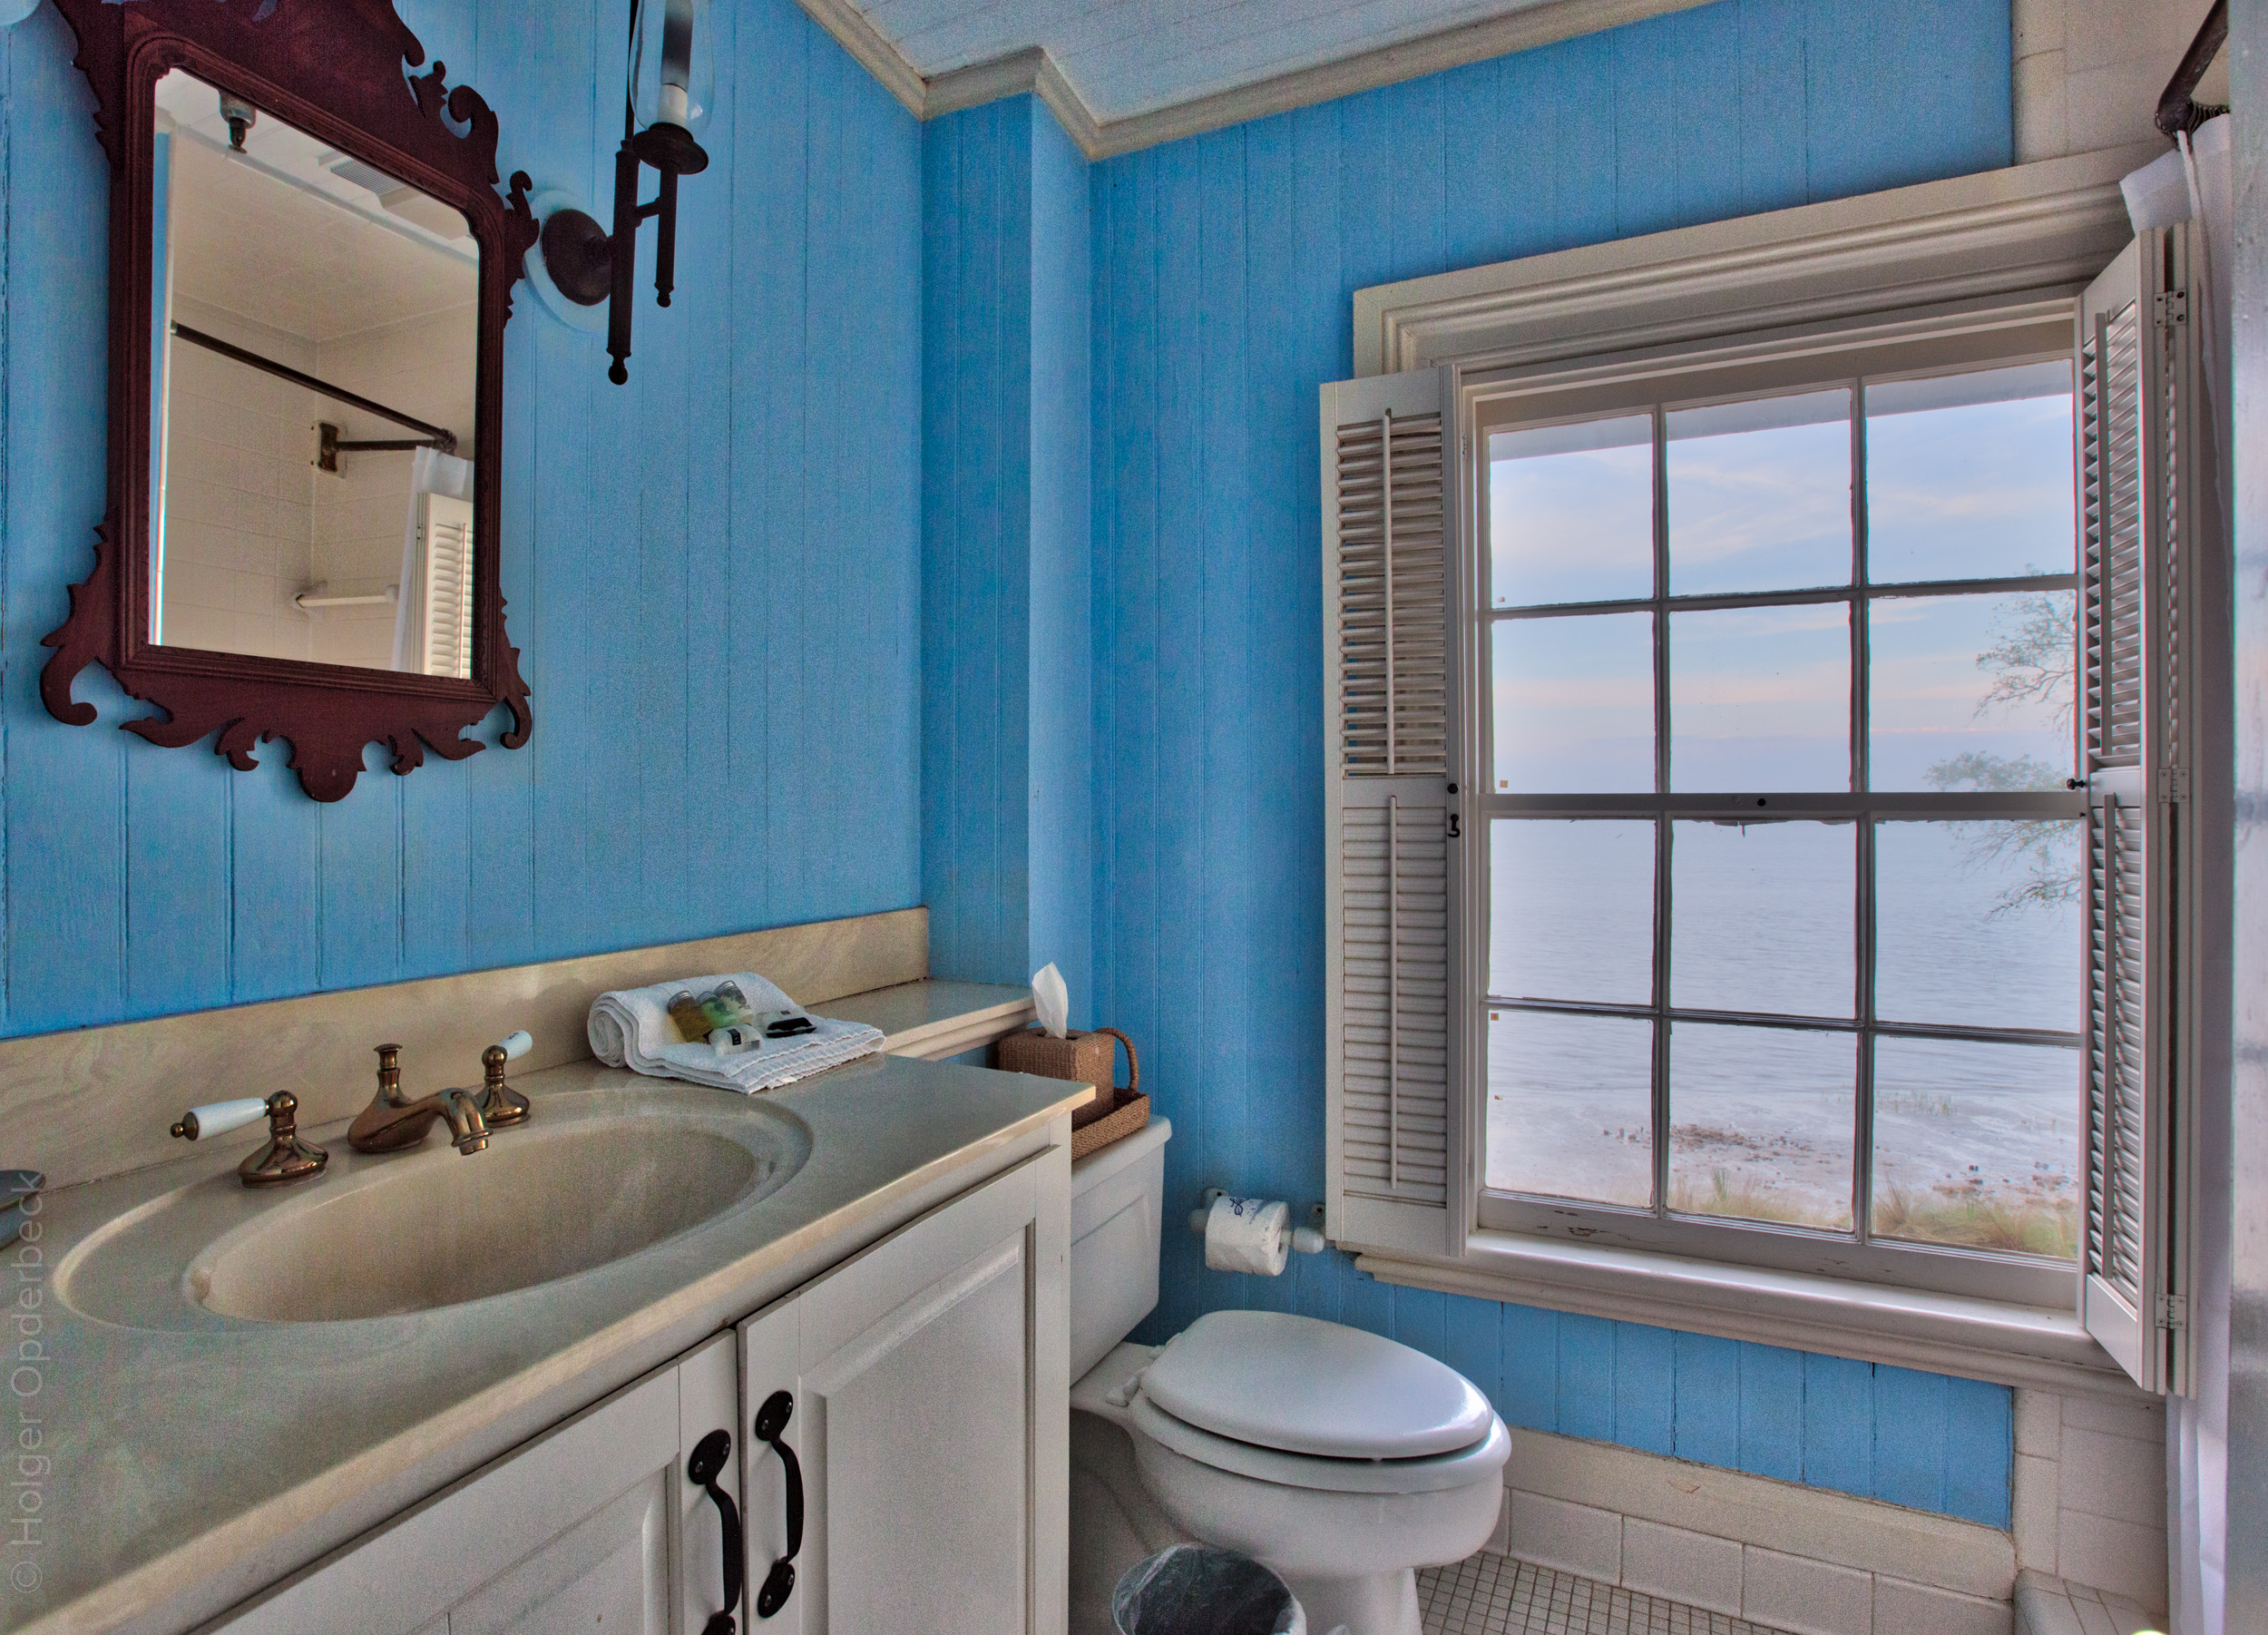 blodgett-bathroom.jpg